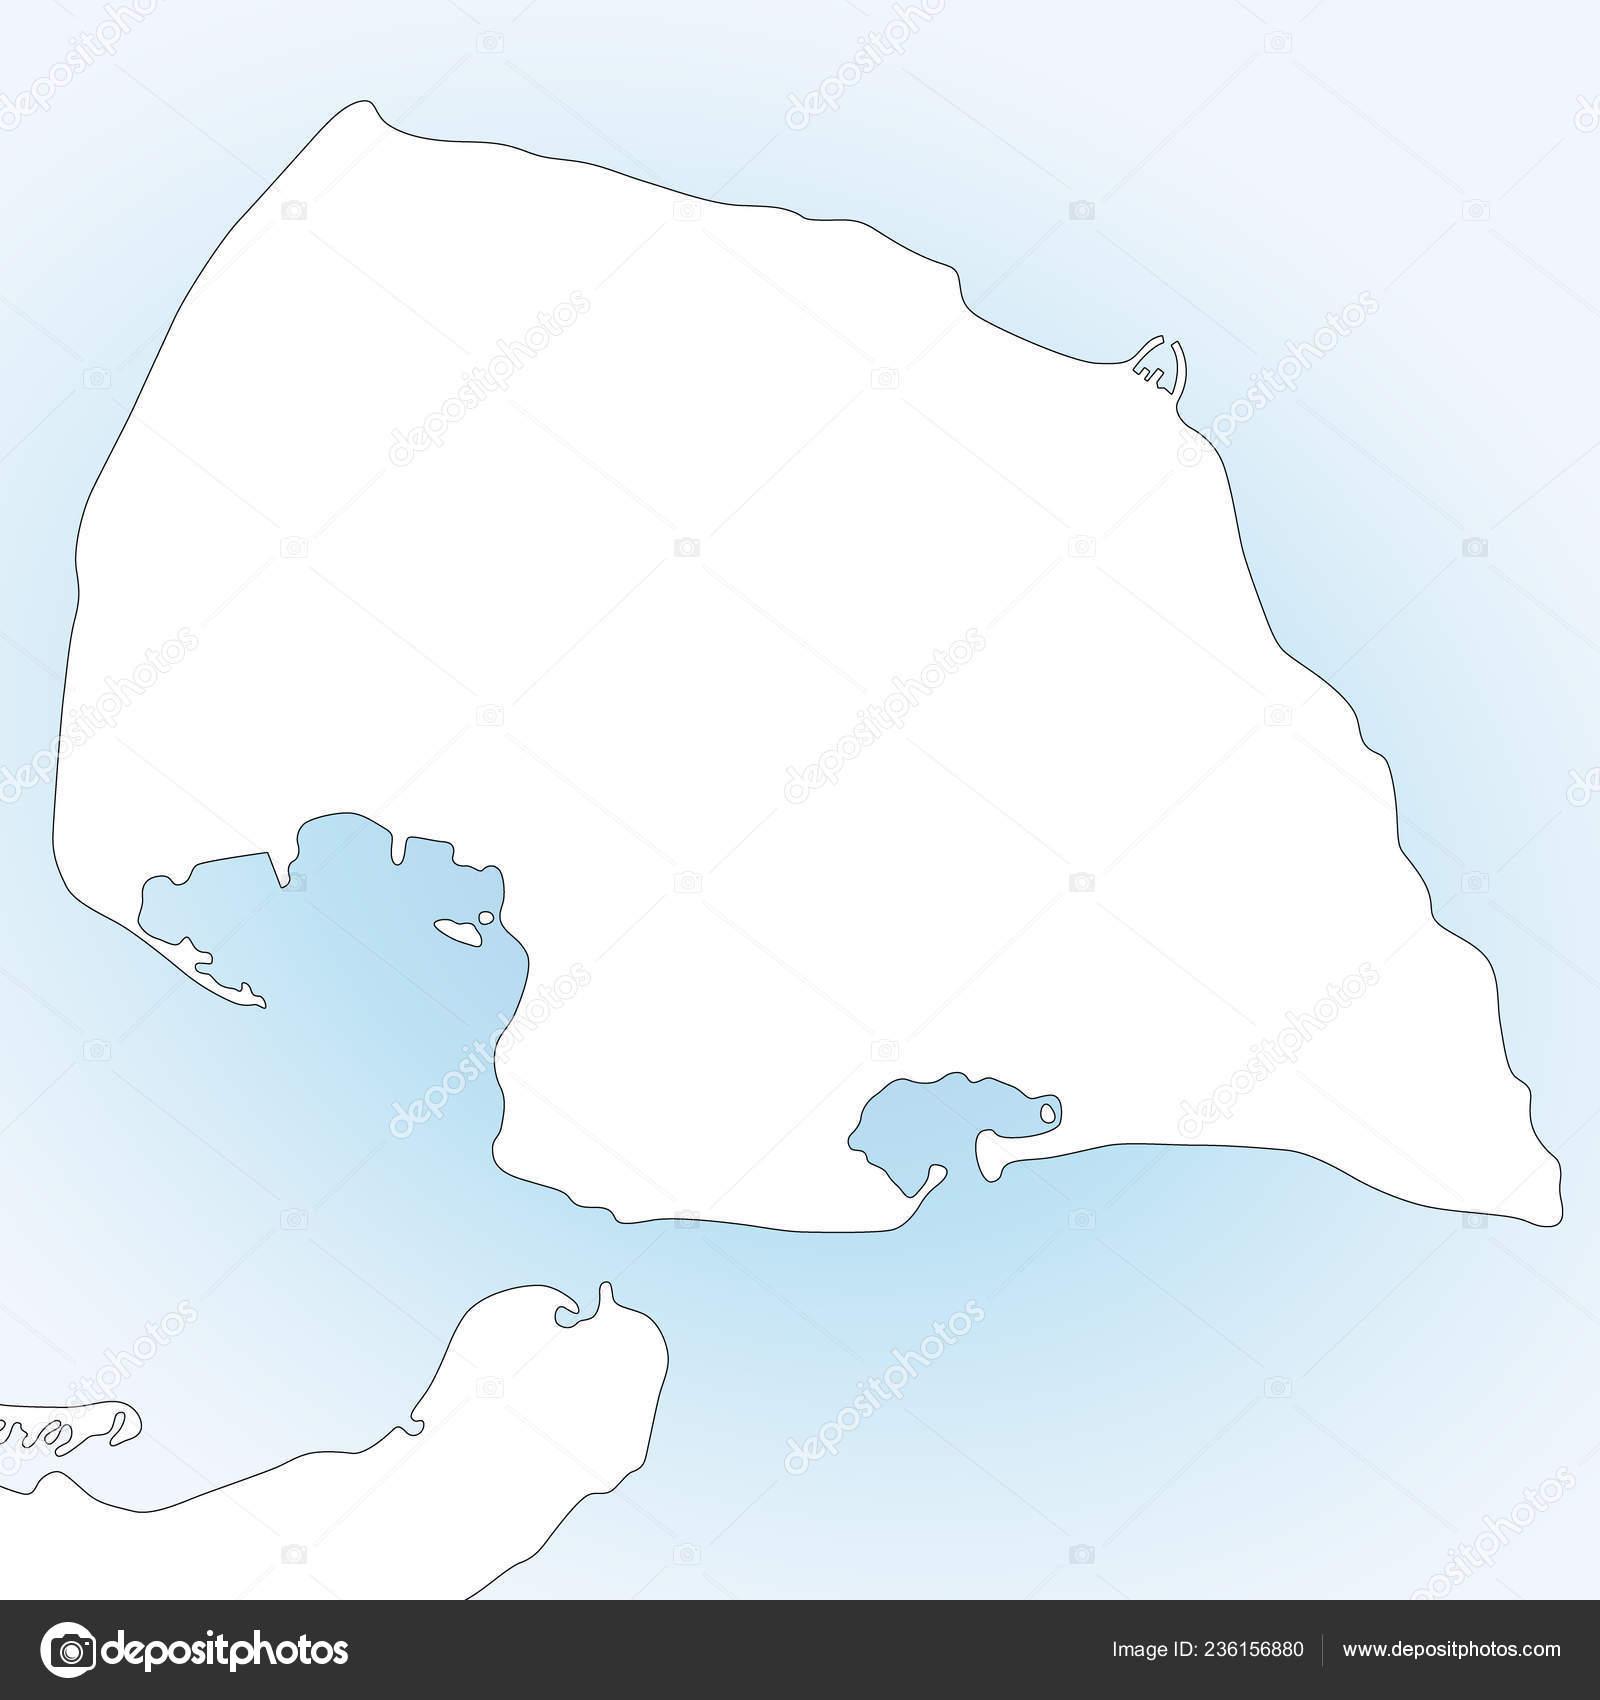 Fehmarn Karte Insel.Deutschland Karte Der Insel Fehmarn Stockvektor C Ii